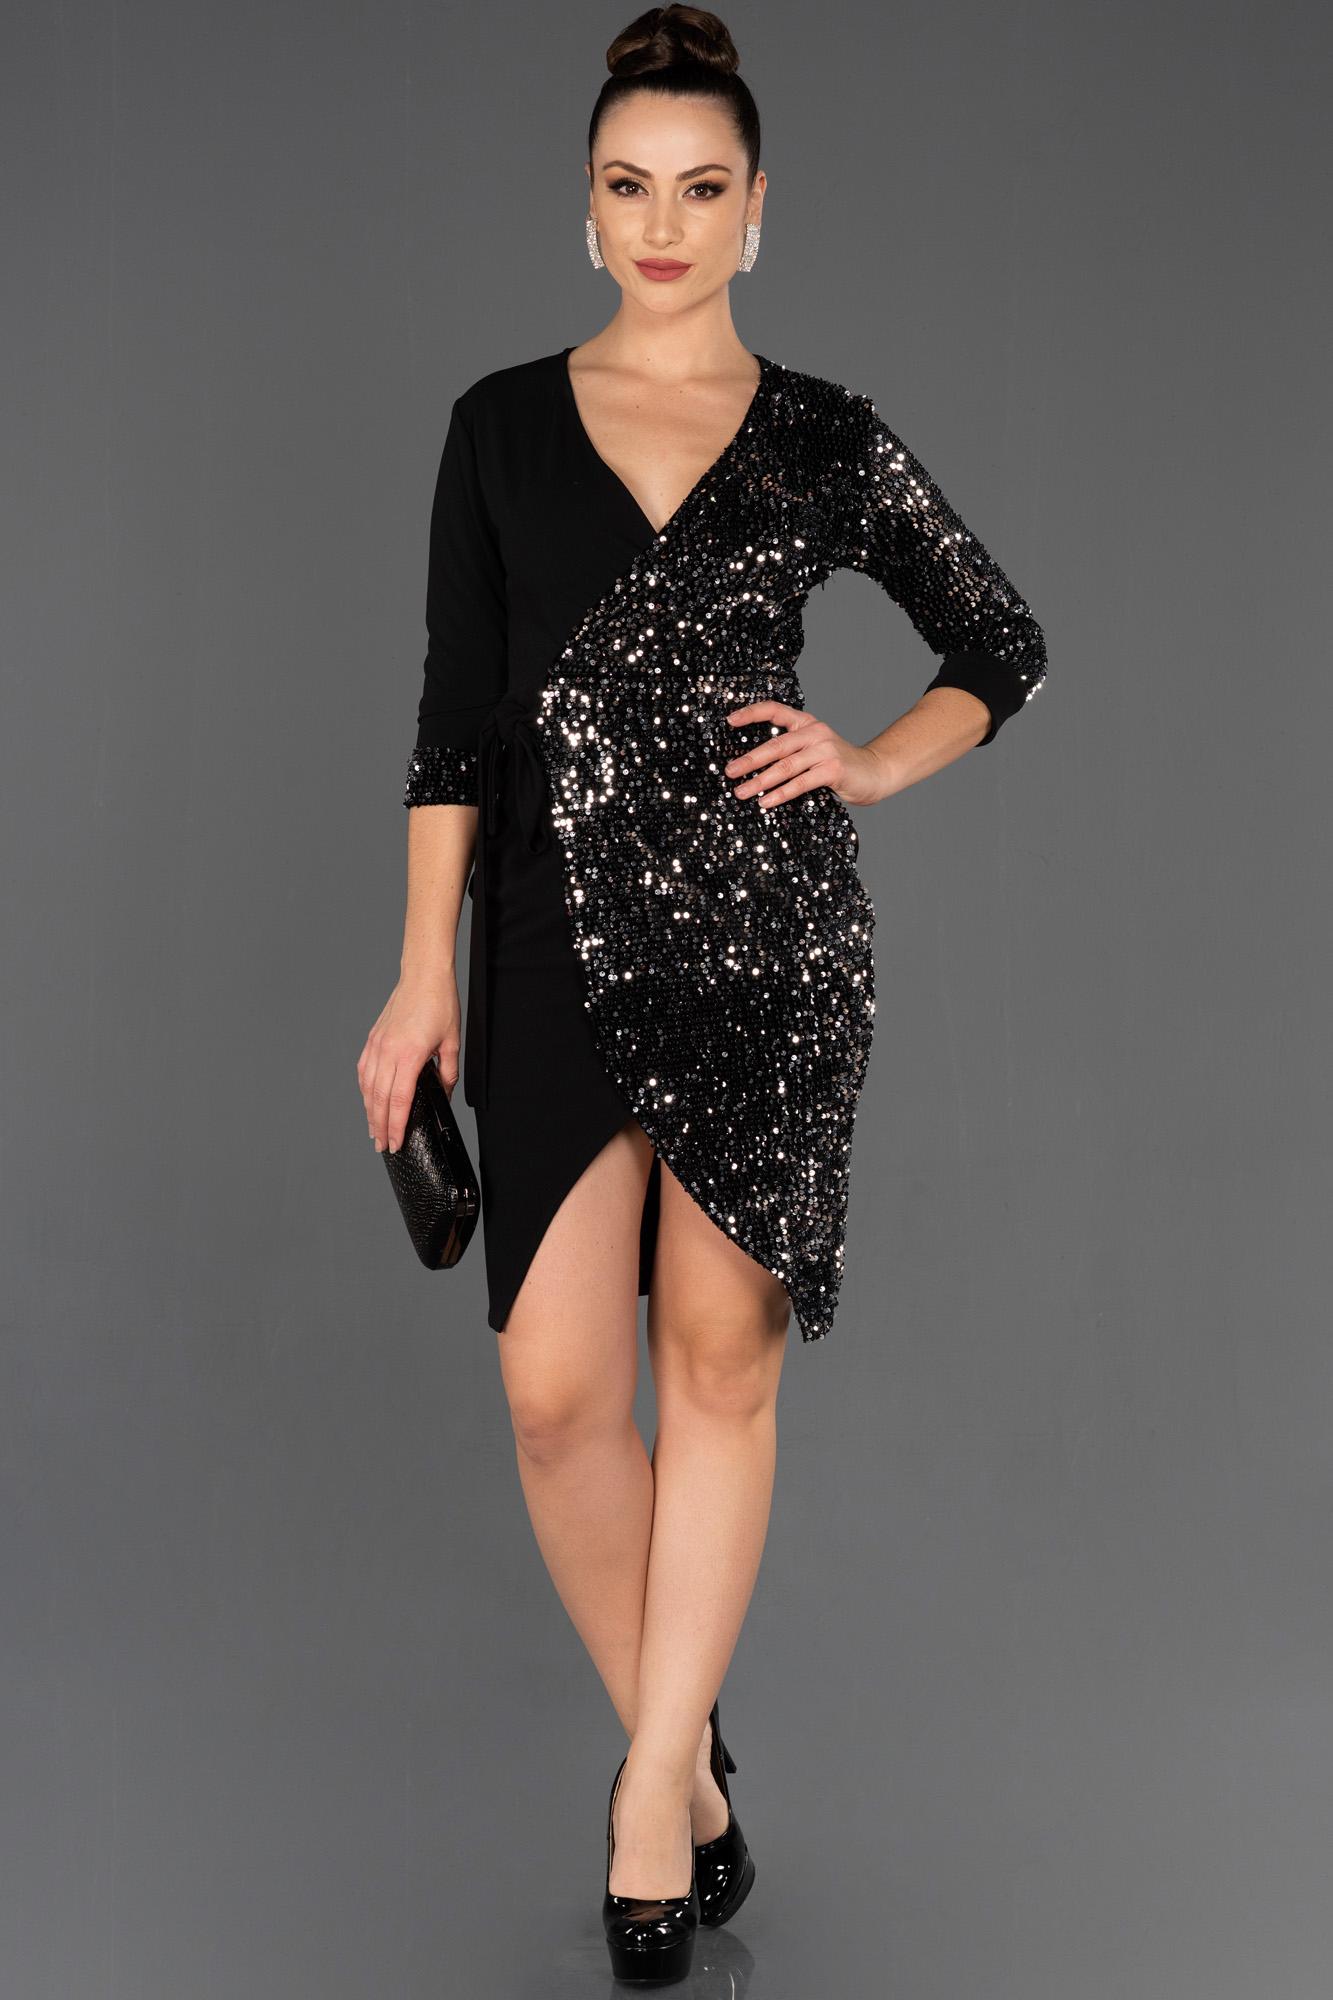 Siyah-Gümüş Kruvaze Yaka Davet Elbisesi